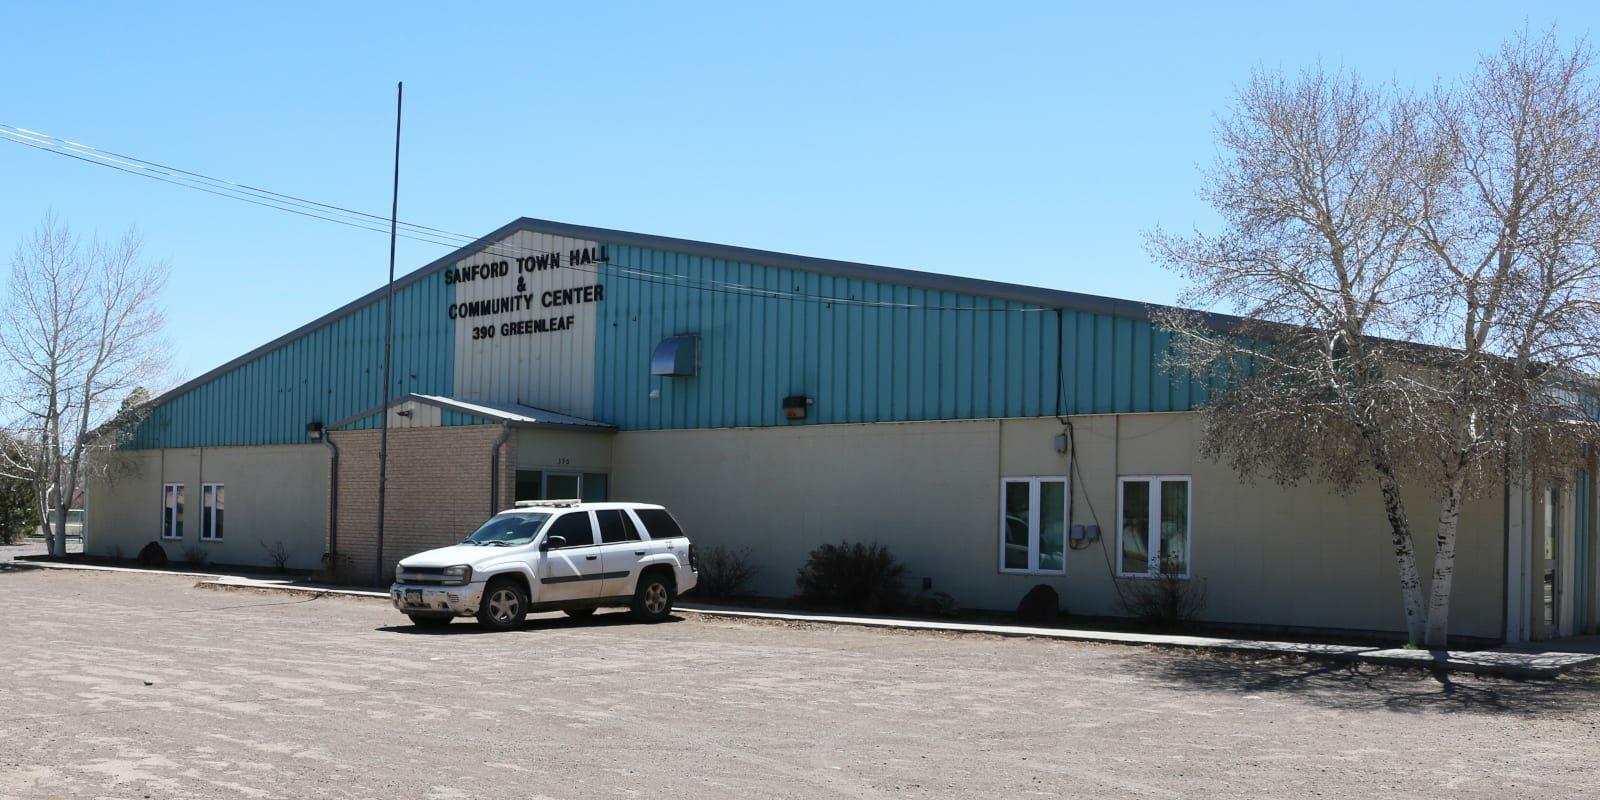 Sanford Colorado Town Hall Community Center